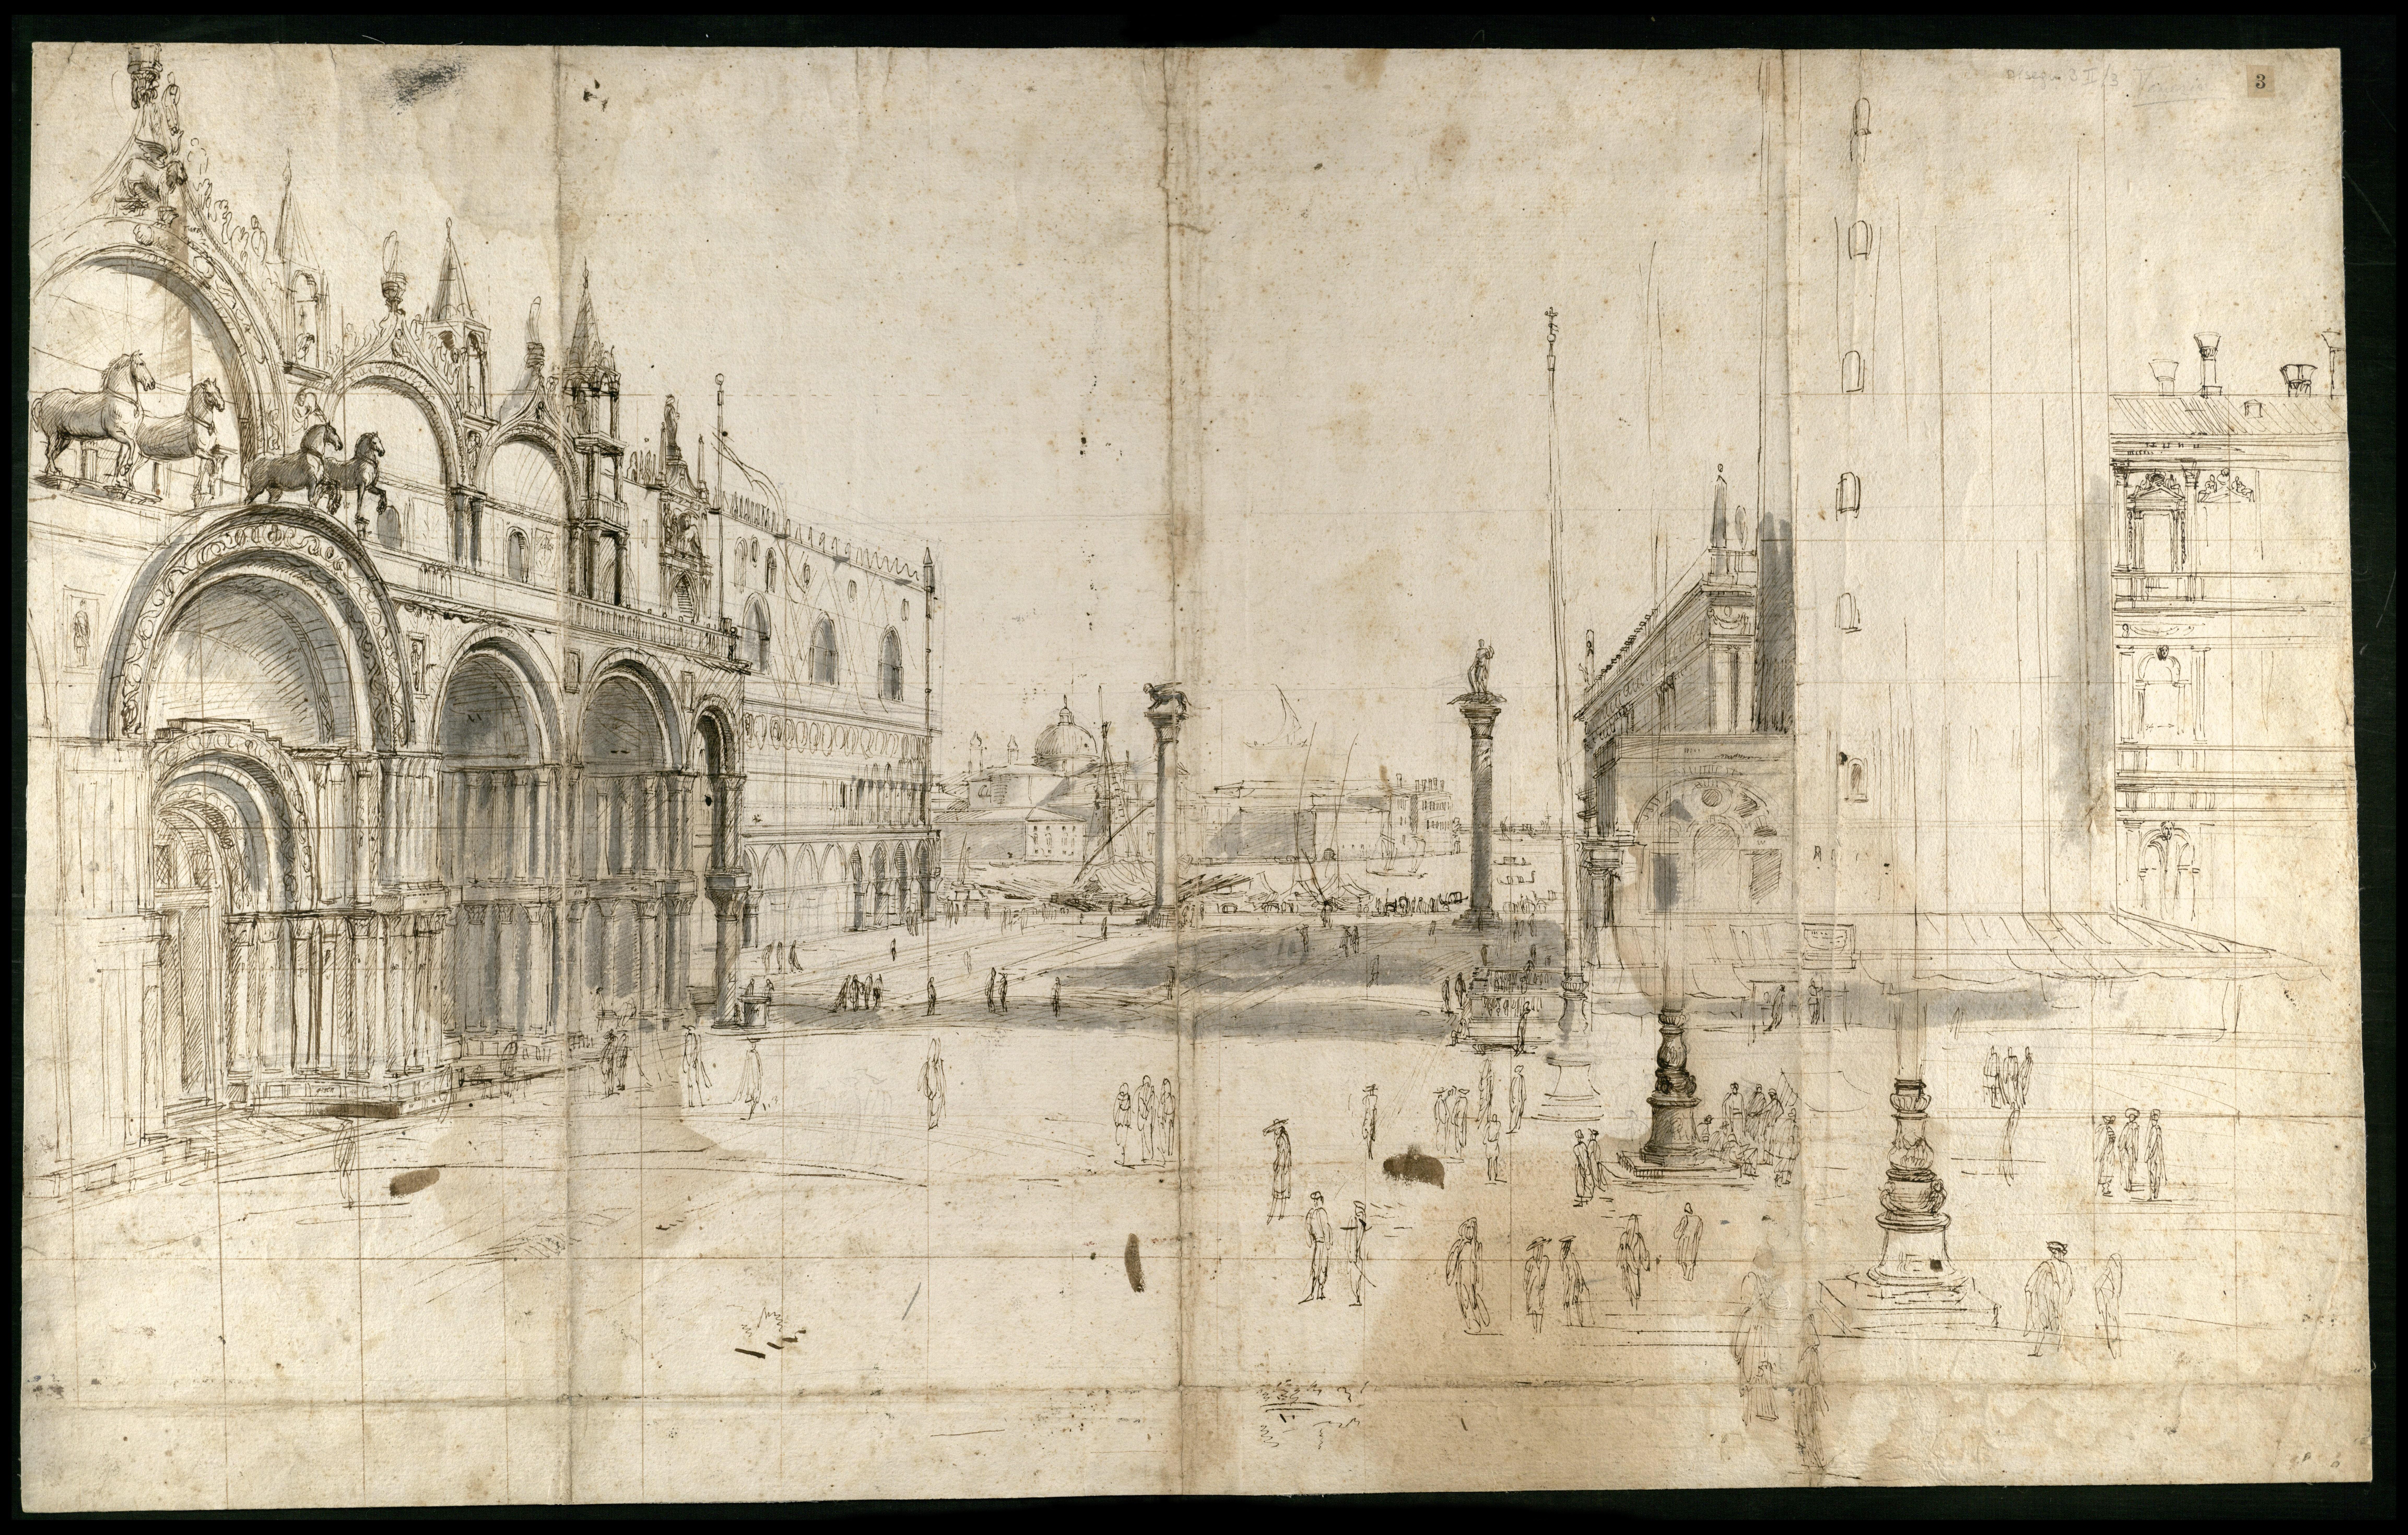 12_BibliotecaNazionaleCentral_RomeCasparvan Wittel_VedutavanhetPiazzettadiSanMarco.jpg